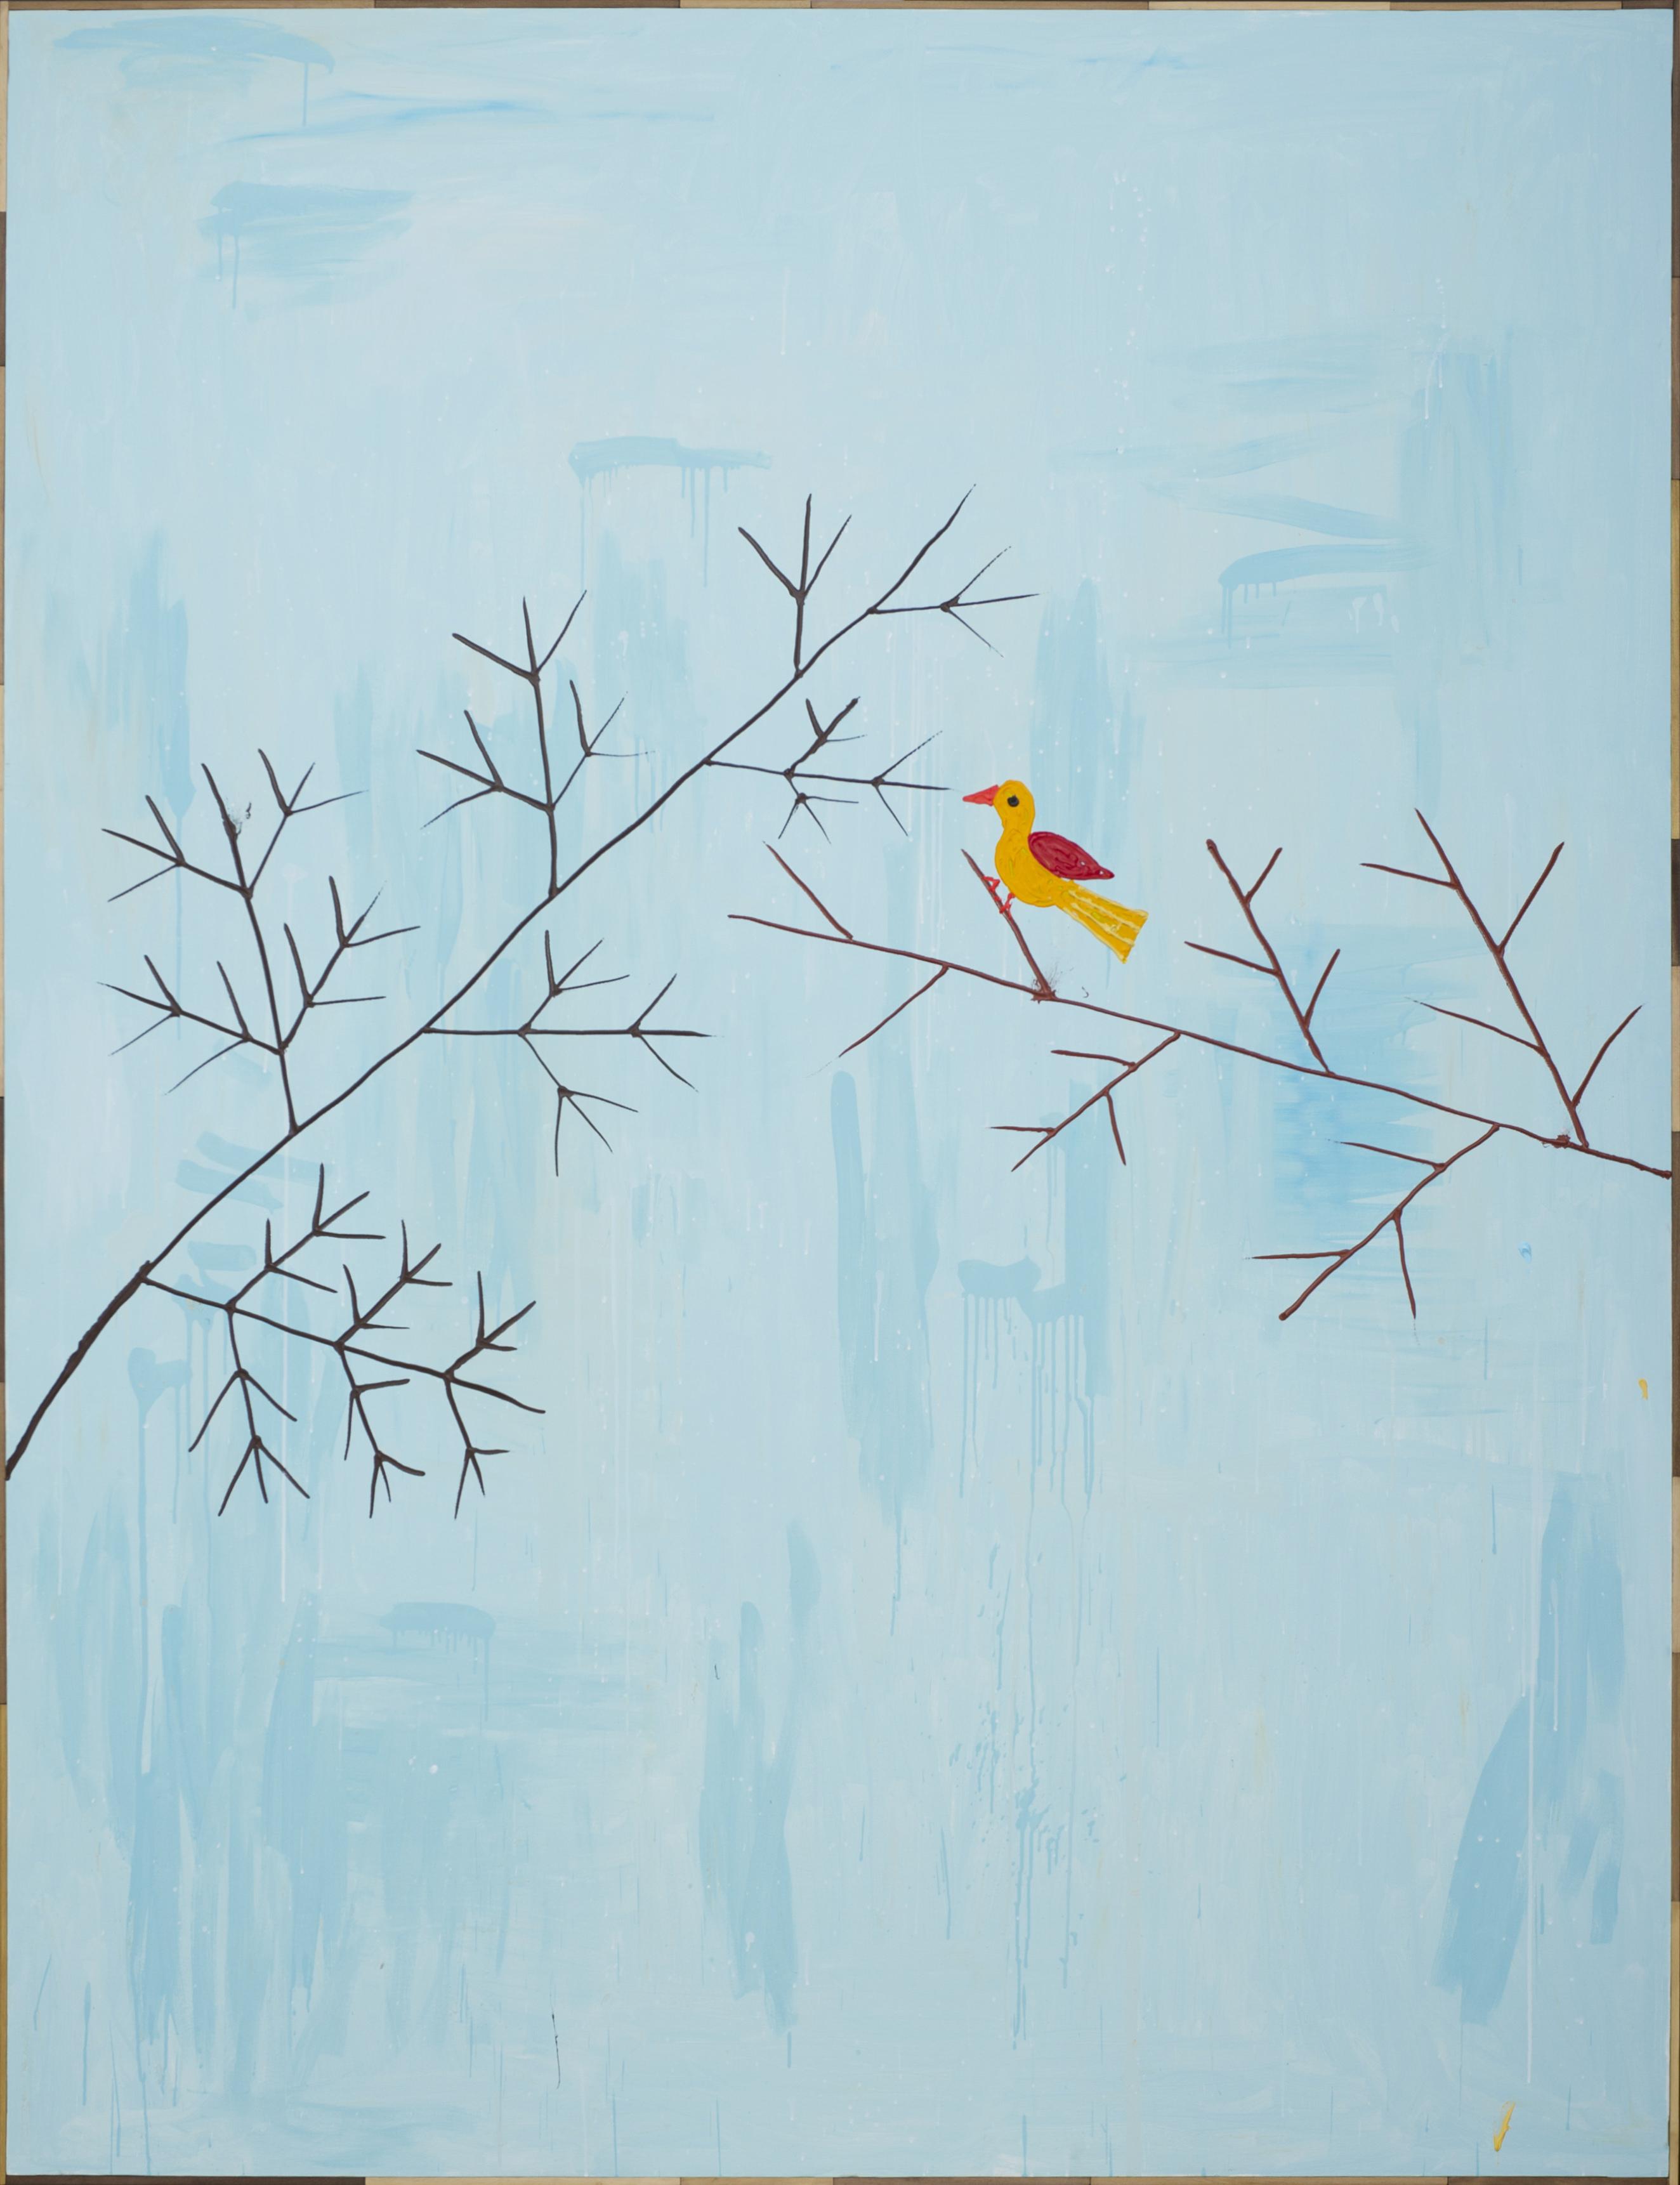 """Pájaro"", Antonio Ballester Moreno, 2013. 253 x 195 cm. Imagen cortesía de Galería ""Montañas"", Antonio Ballester Moreno, 2012. Acrílico sobre lienzo, 195 x 253 cm. Imagen cortesía de Galería MAISTERRAVALBUENA."